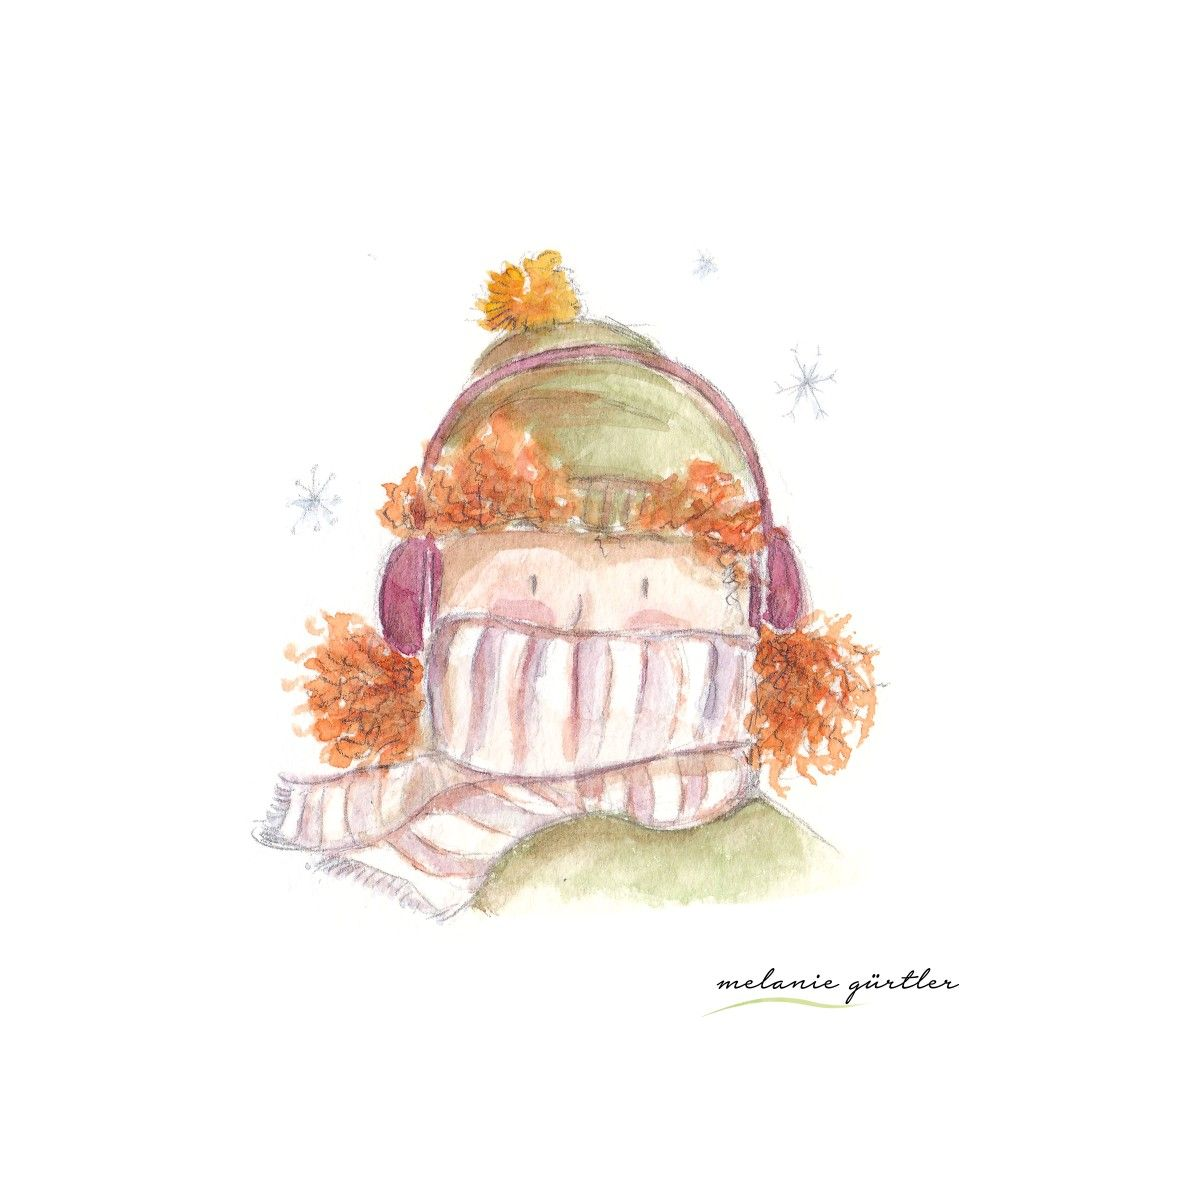 Winter Kalt Aquarell Kinderbuch Melanie Gurtler Illustration